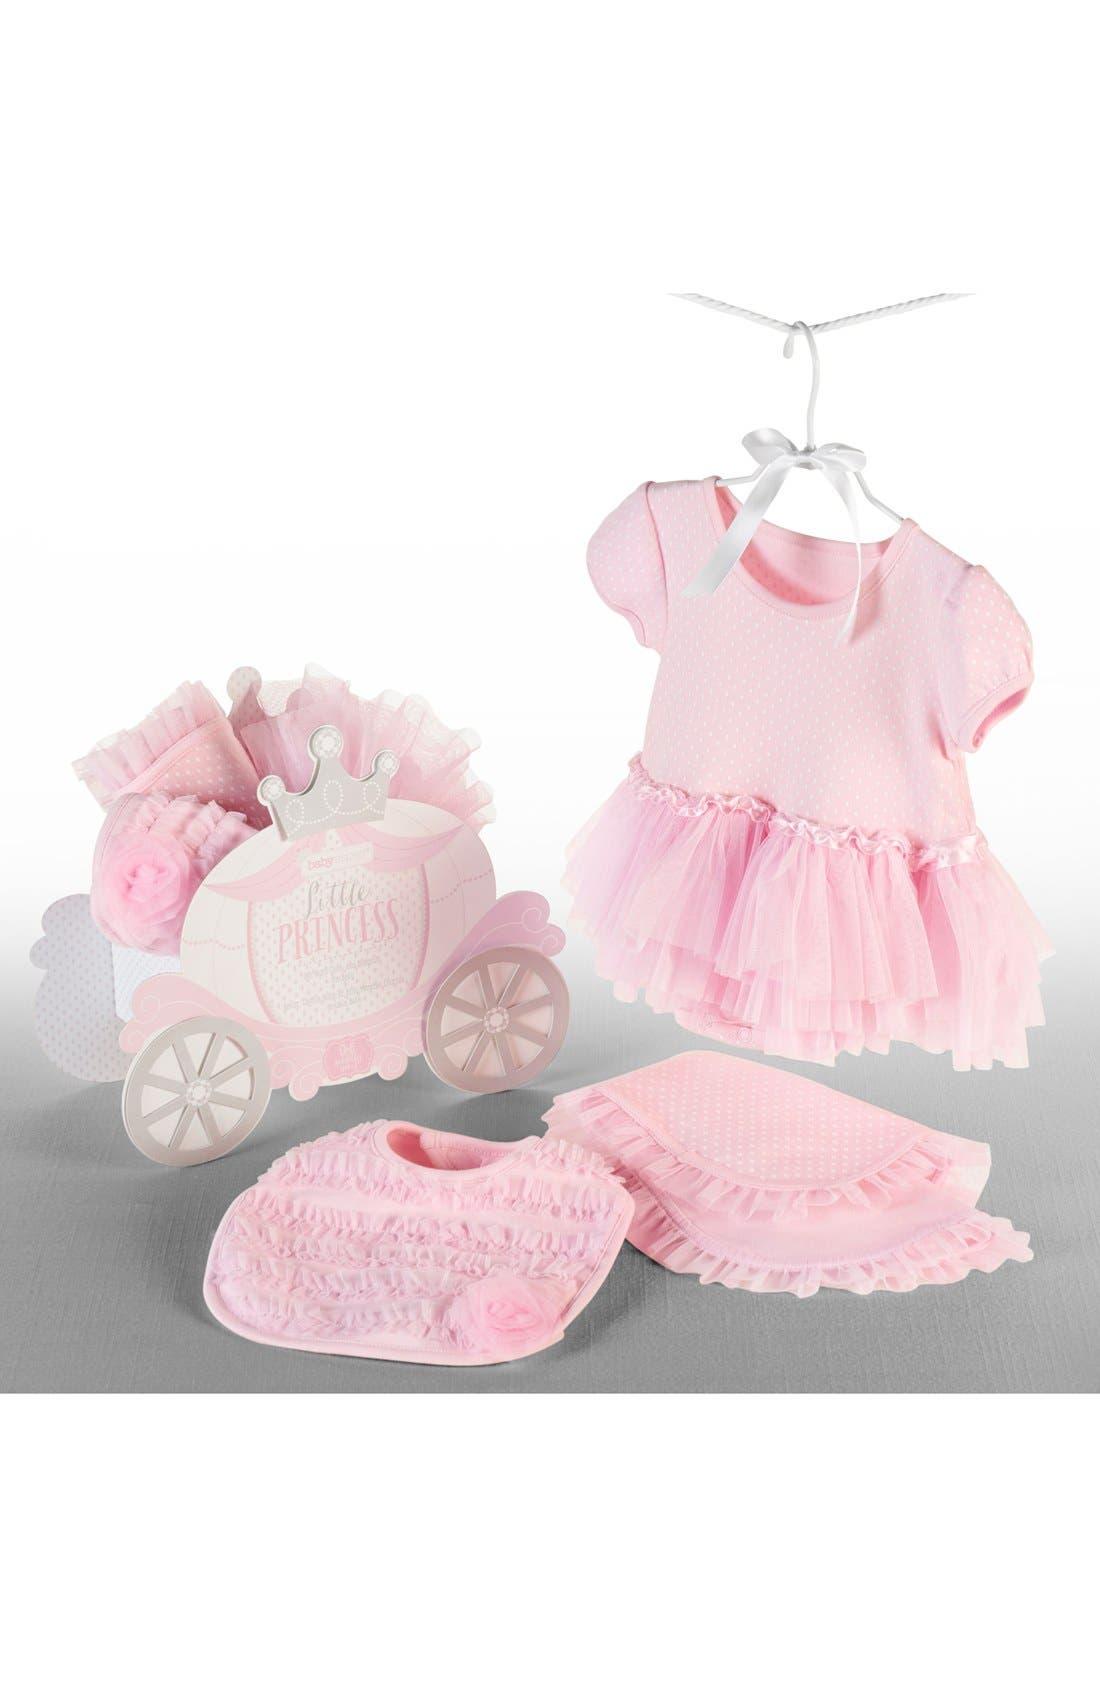 Main Image - Baby Aspen Little Princess 3-Piece Gift Set (Baby Girls)